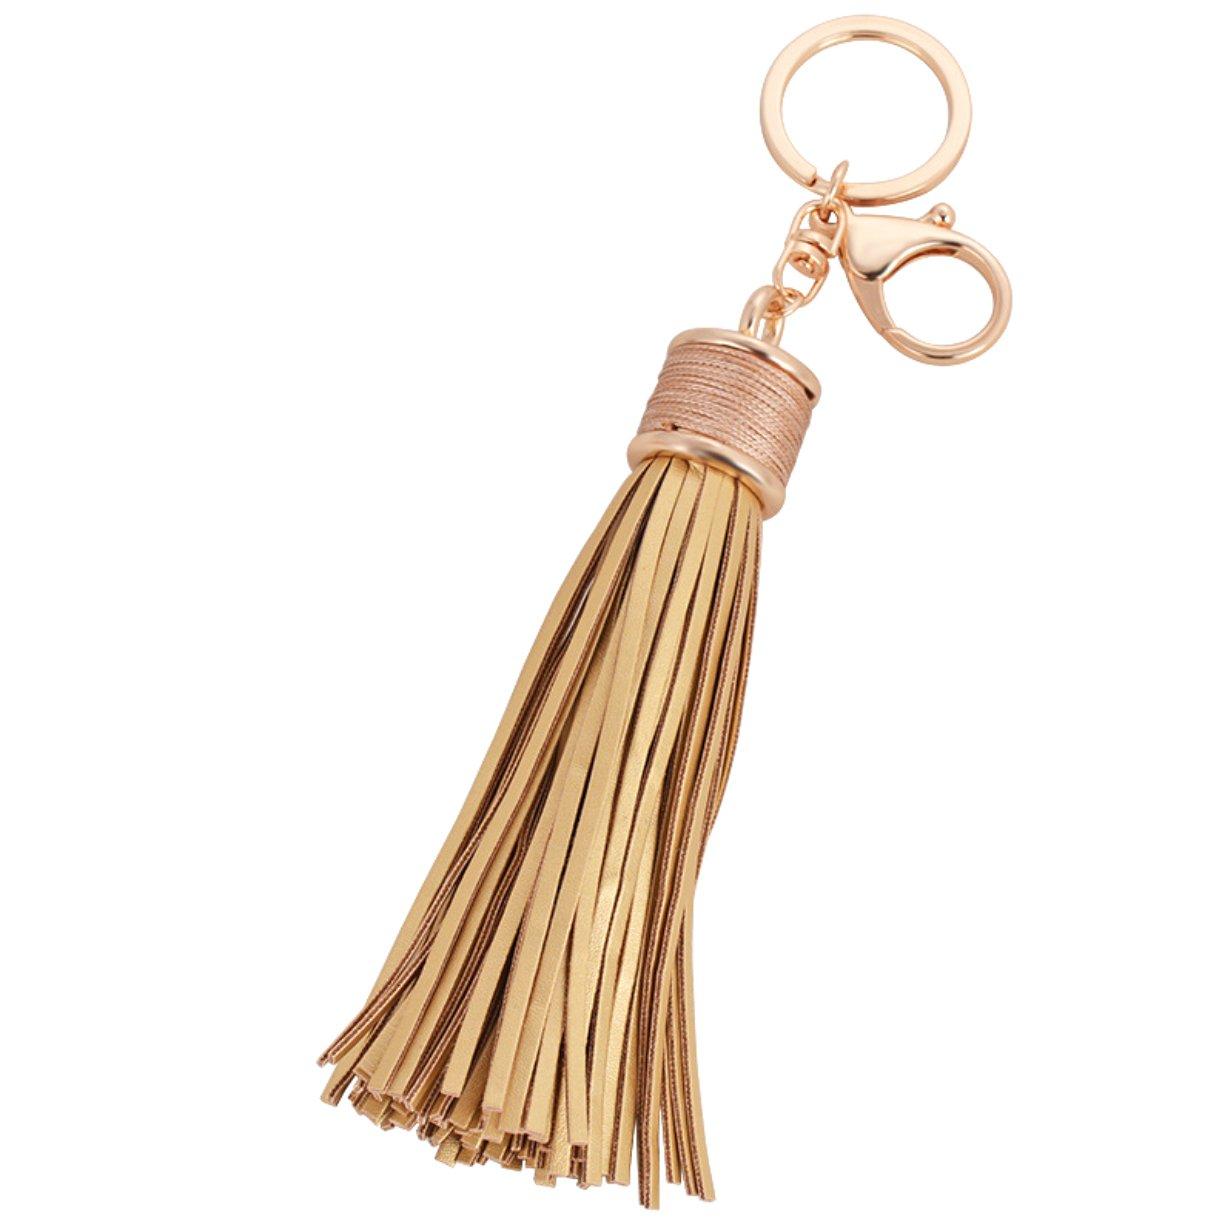 Elesa Miracle Women Leather Tassel Keychain, Handbag Wallet Accessories, Car Key Chain Rings Car Key Chain Rings (Black)